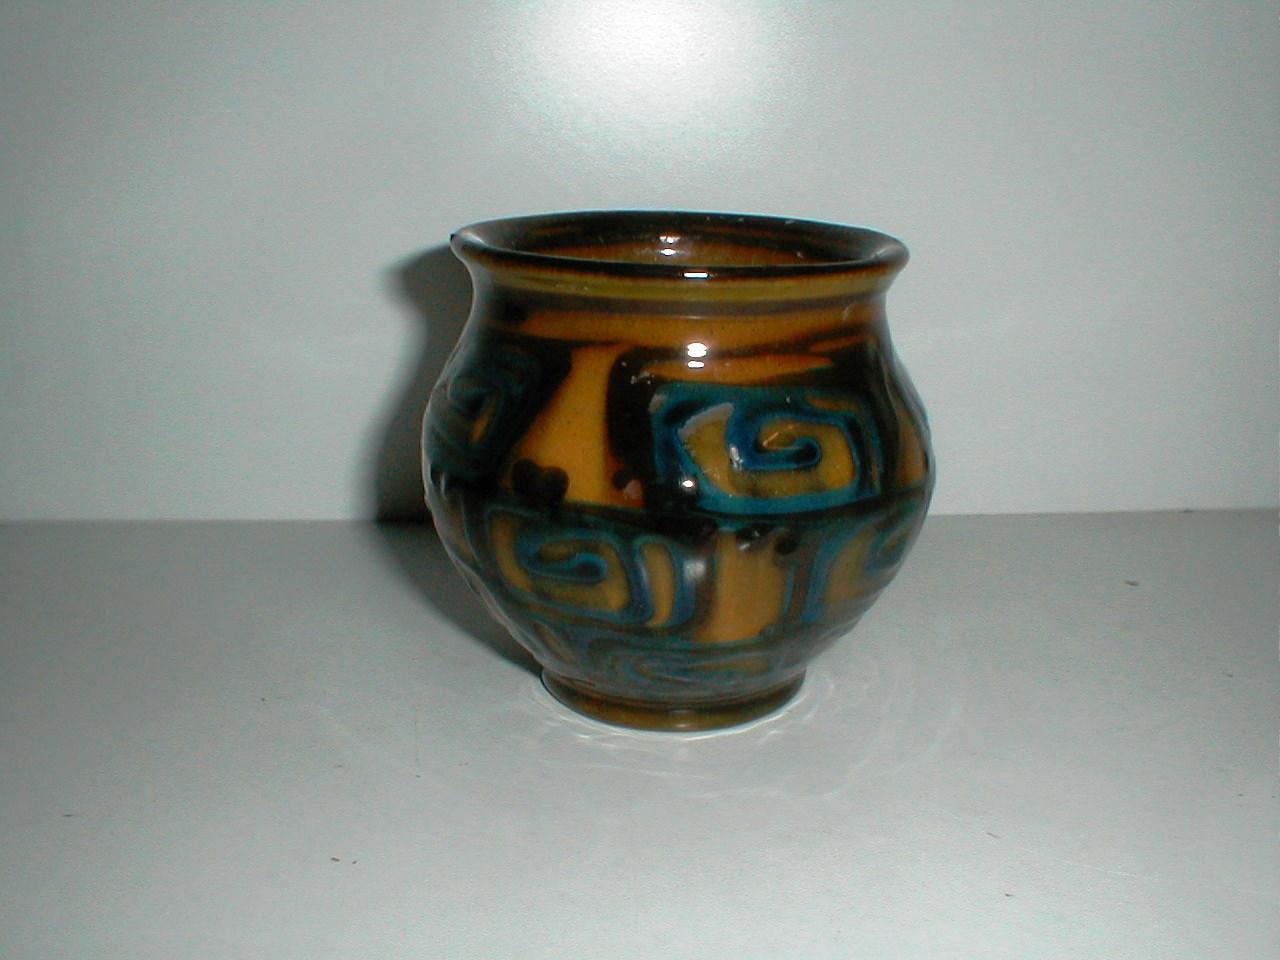 keramik vase kähler Herman A. Kæhler ceramic pottery stoneware Næstved Denmark keramik vase kähler